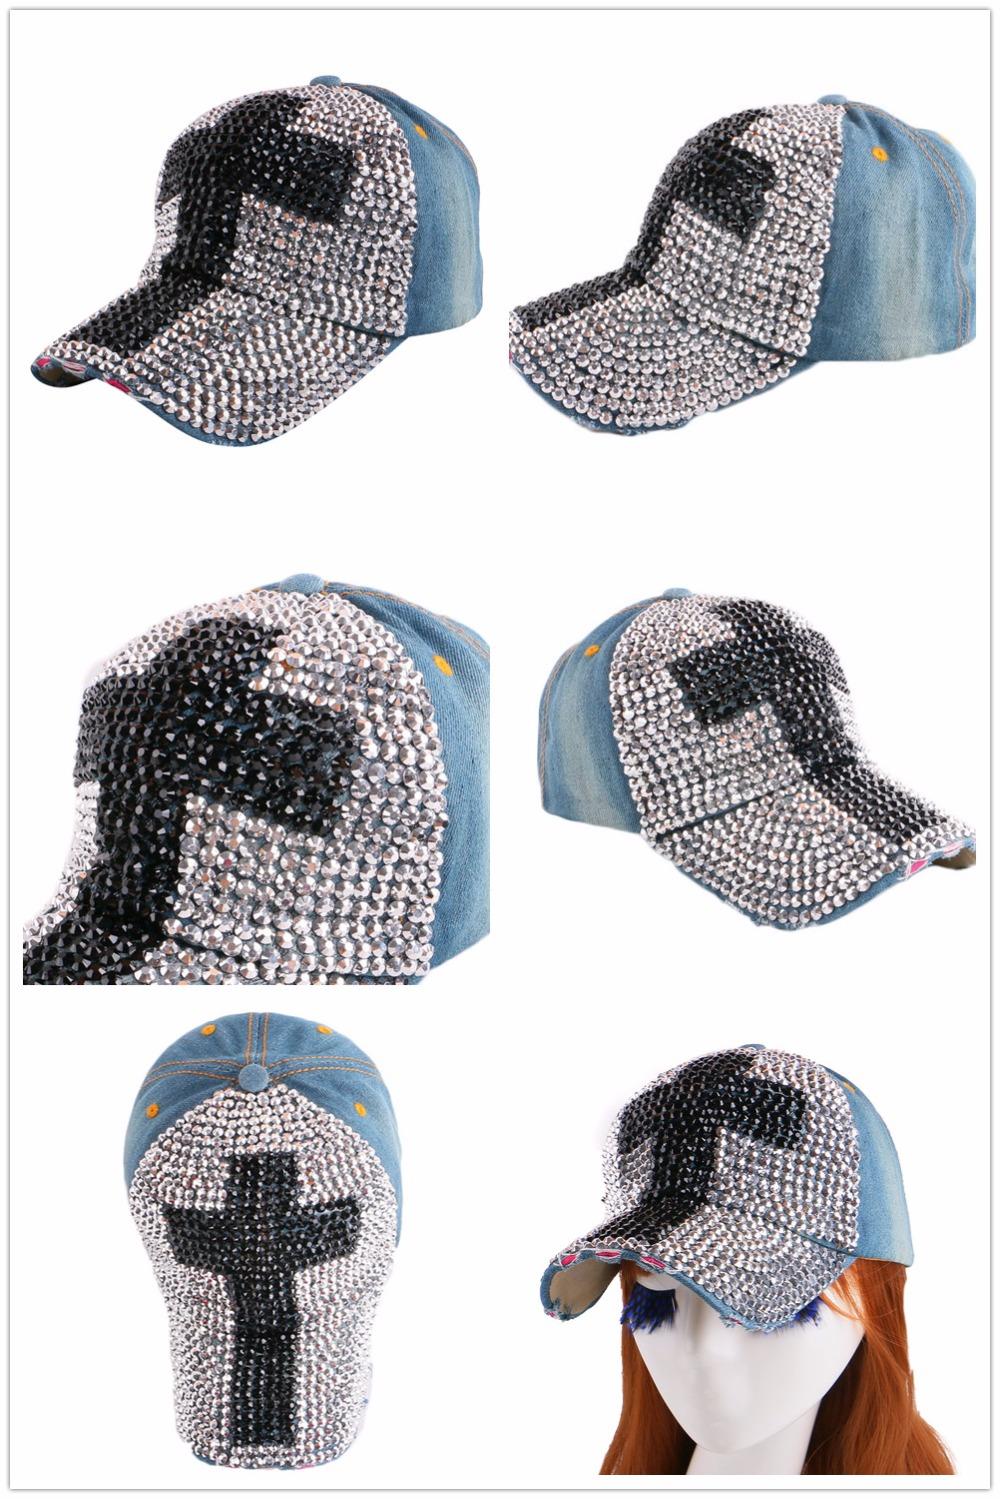 High Quality WOMEN brand baseball cap new fashion rhinestone crystal denim snapback caps wholesale woman hip hop snapbacks hats 12